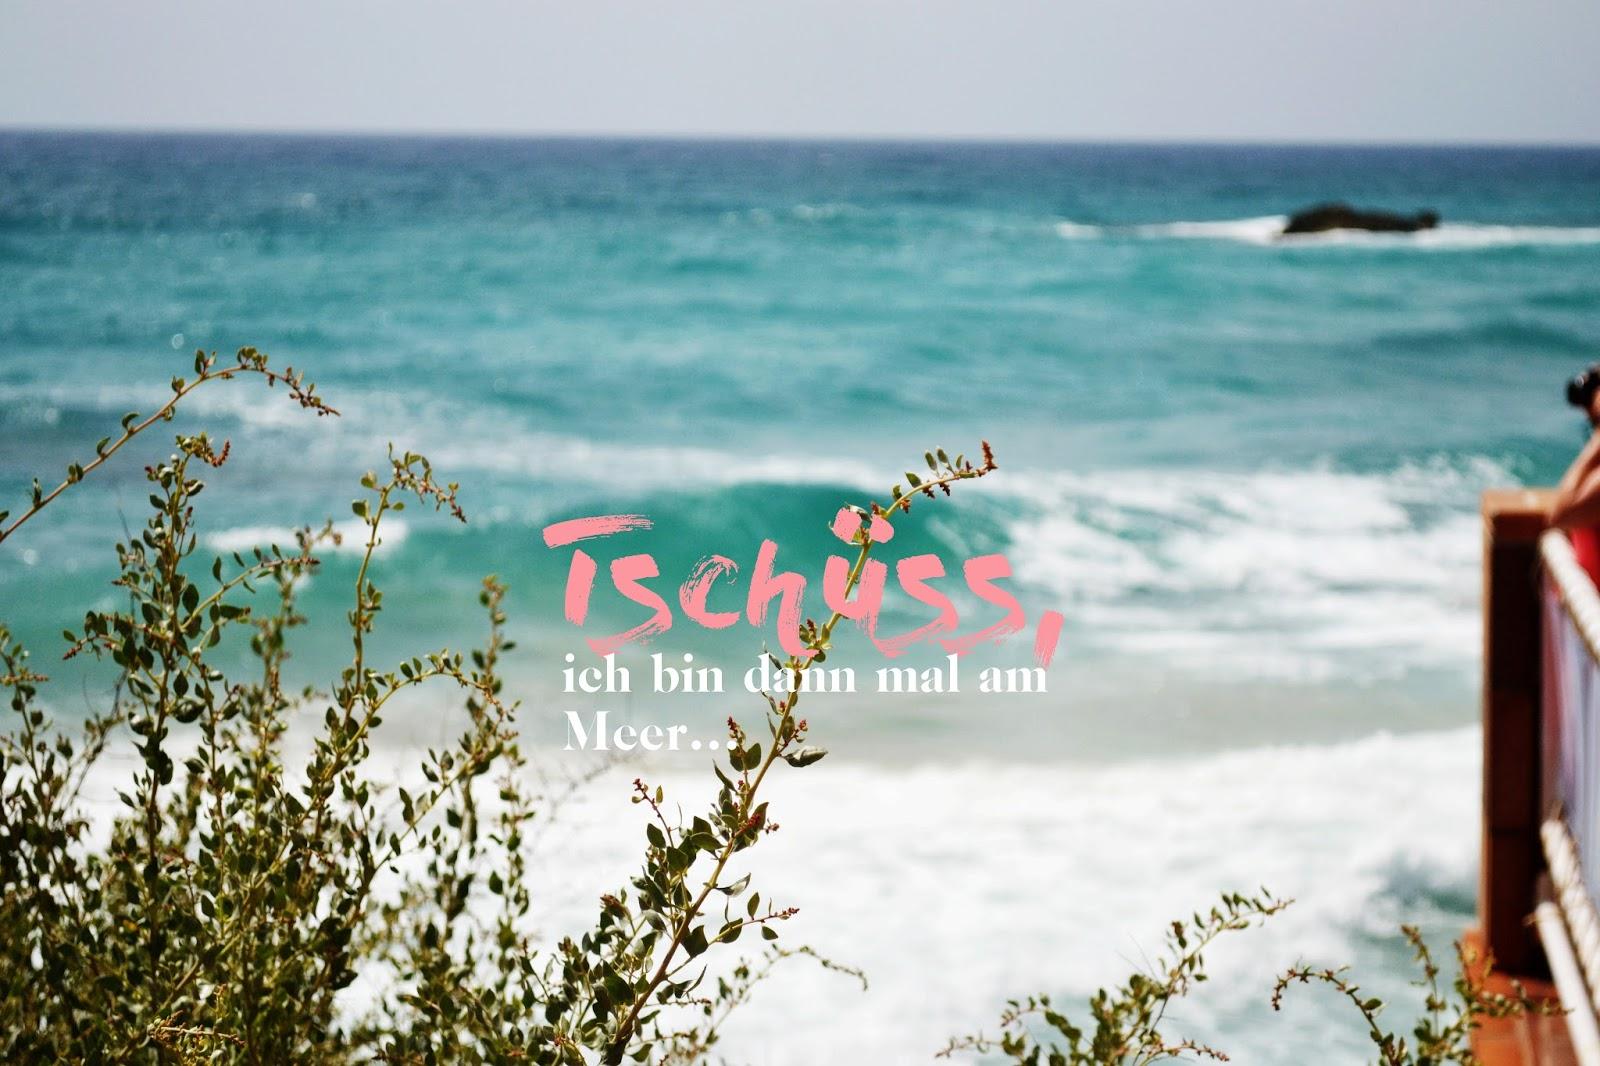 Life Update Happiness Comes In Waves Ich Bin Dann Mal Am Meer